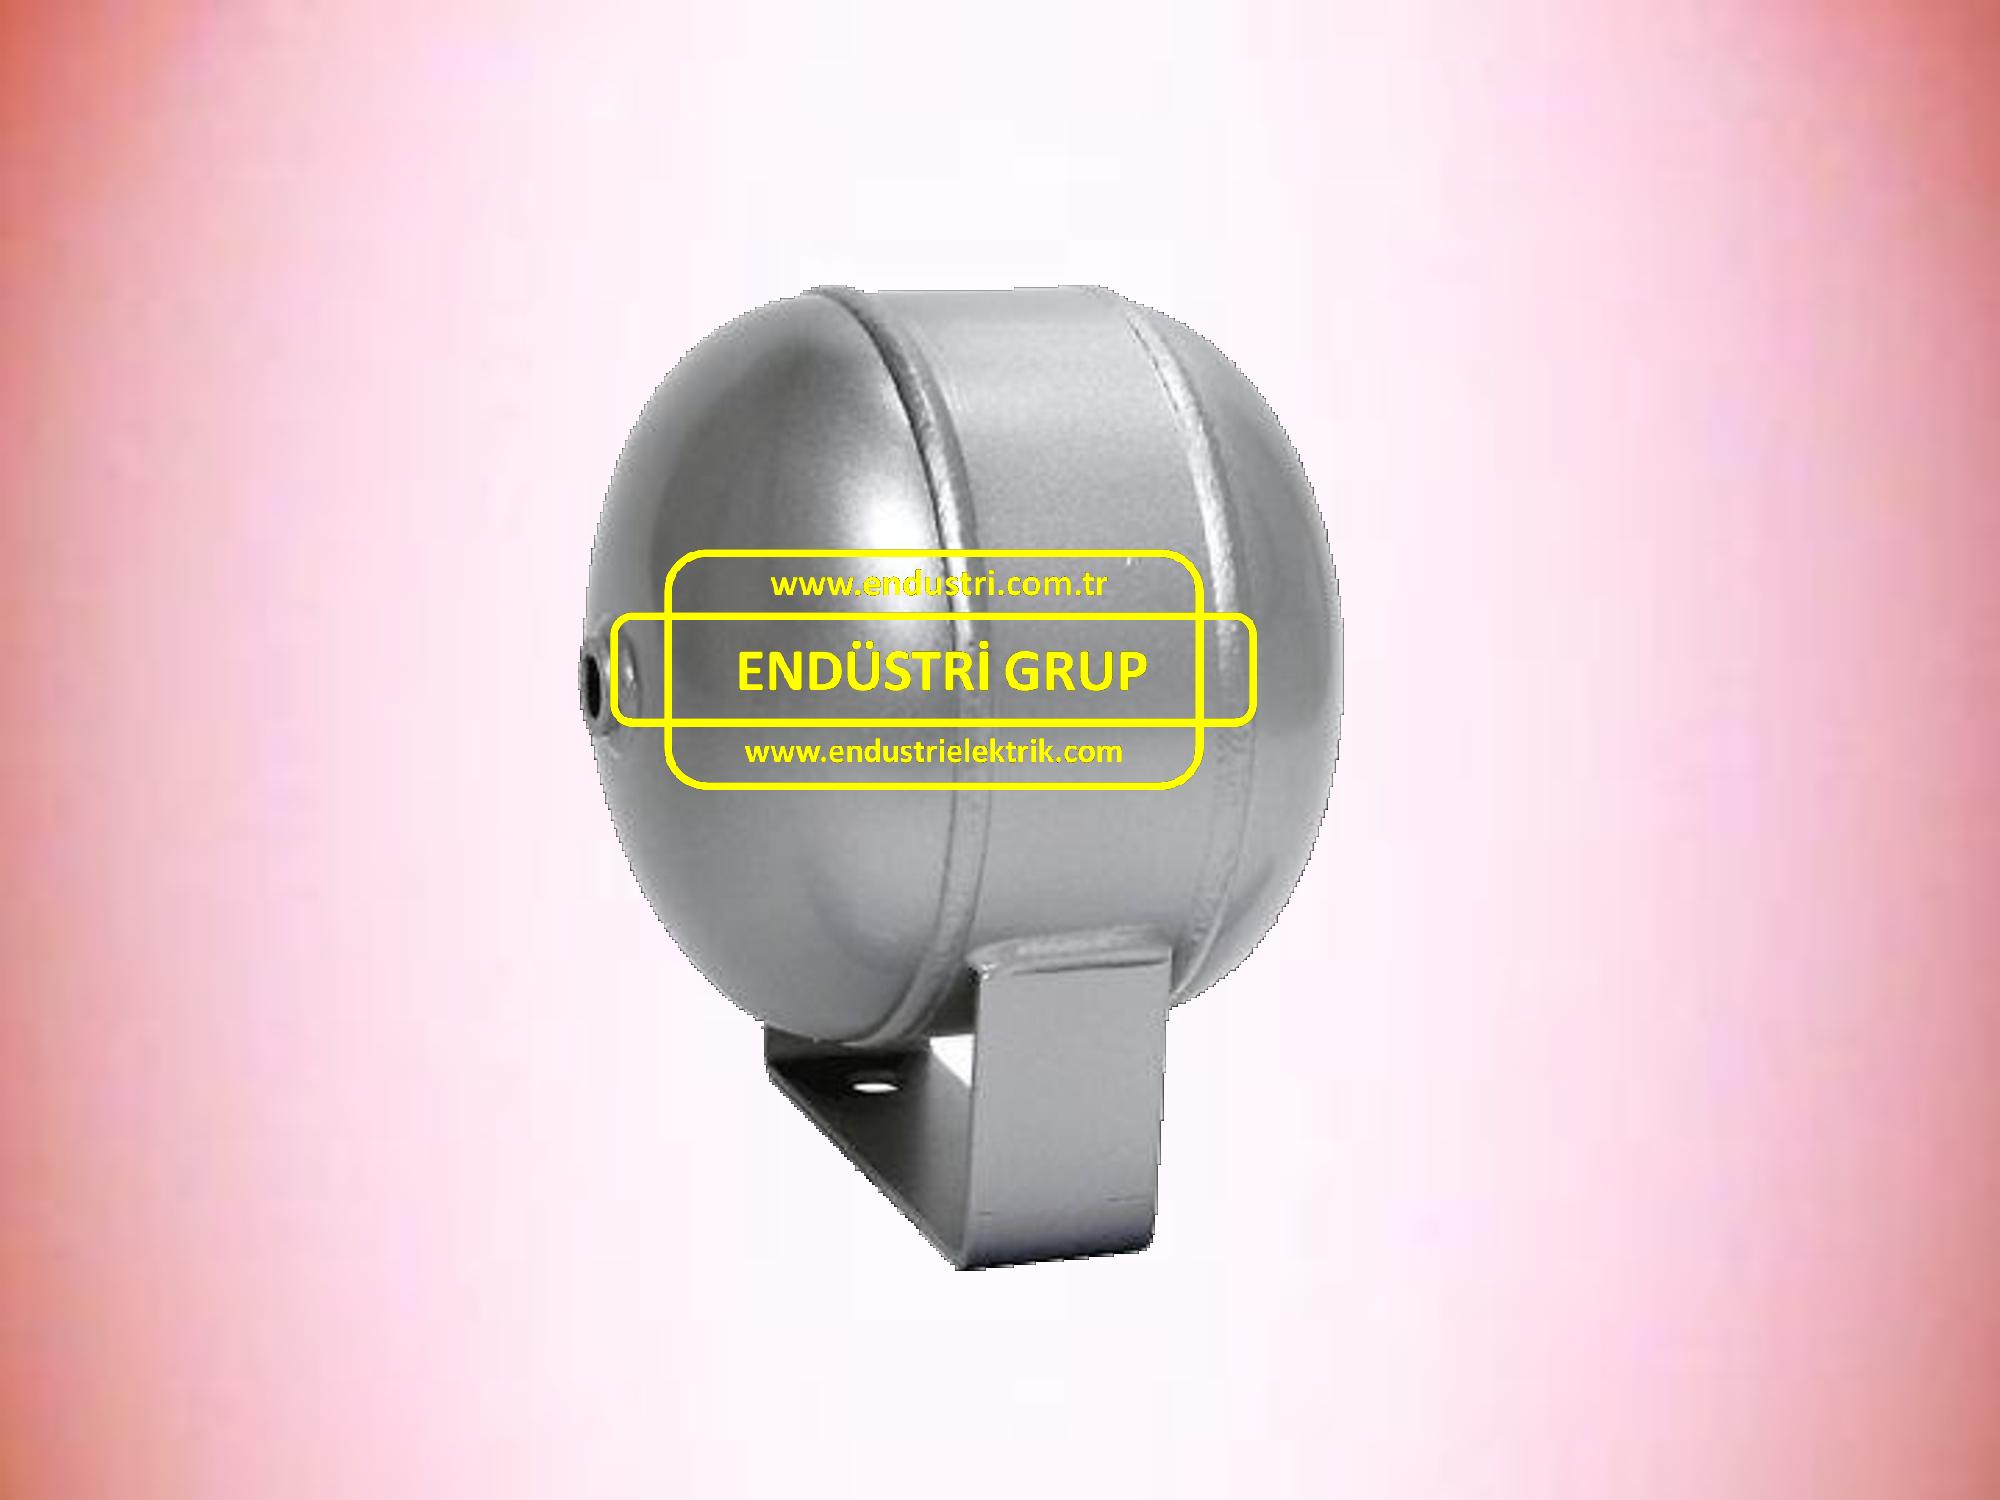 basincli-kompresor-hava-tanki-emniyet-ventili-paslanmaz-celik-tank-imalati